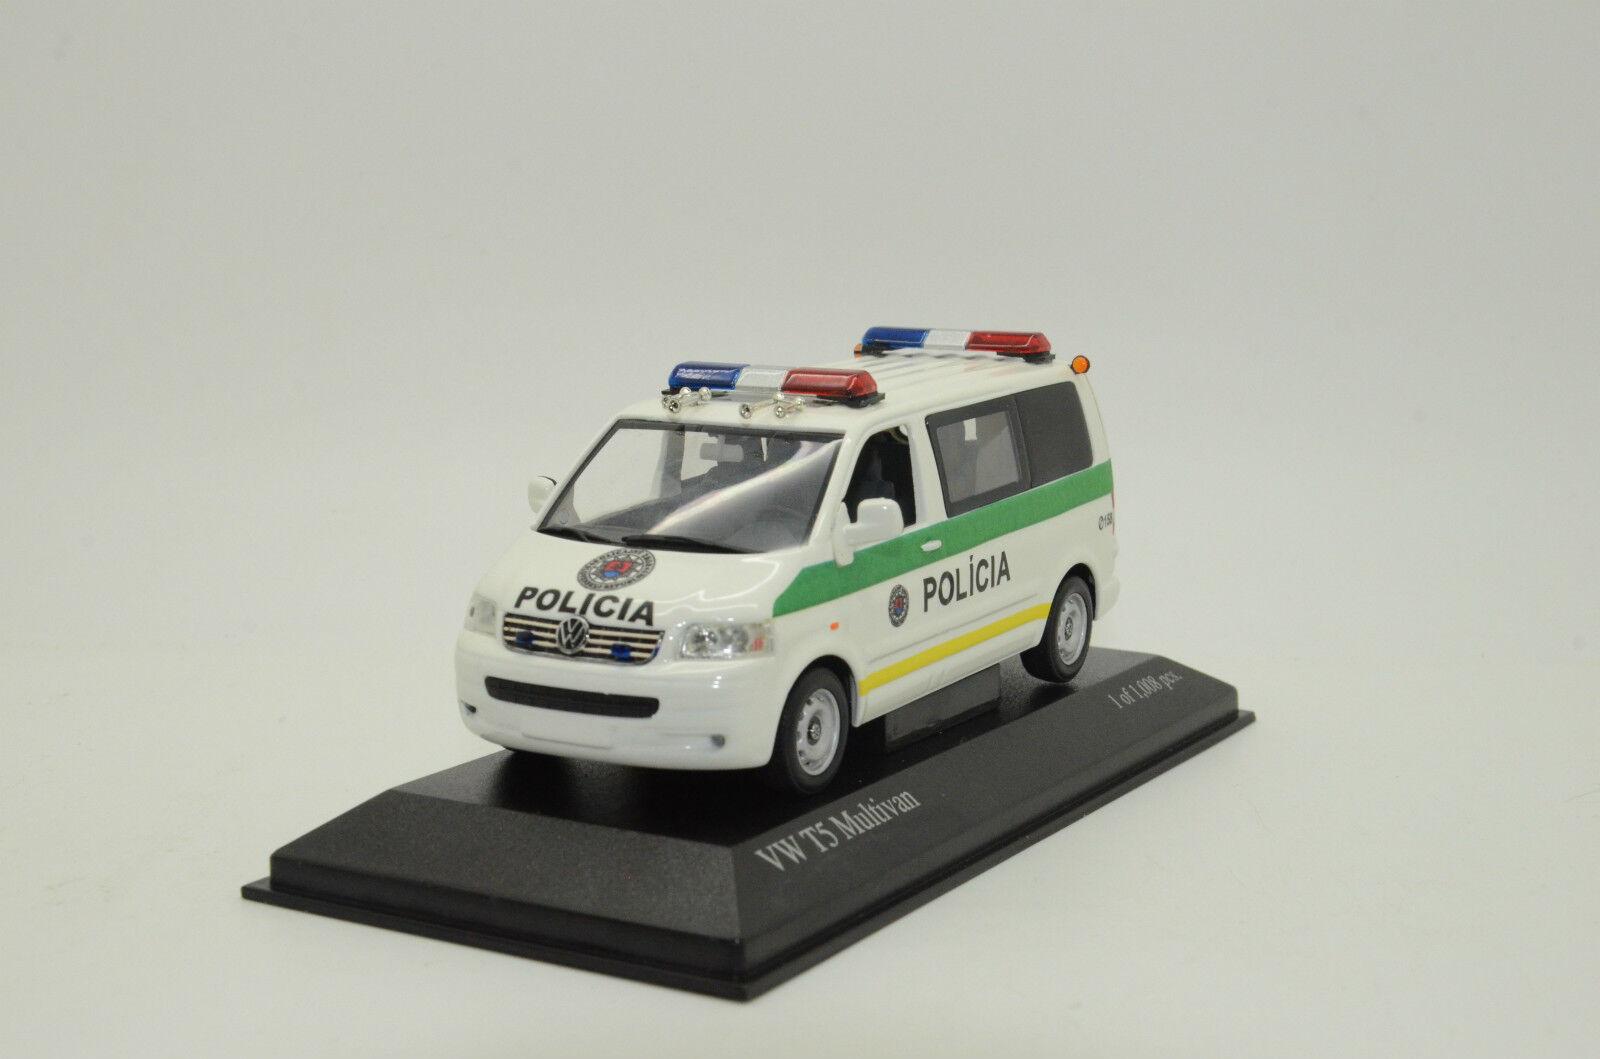 ATLAS IXO 1//43 VOLKSWAGEN VW T4 COMBI FINLAND POLICE POLIS 2000 DIECAST CAR